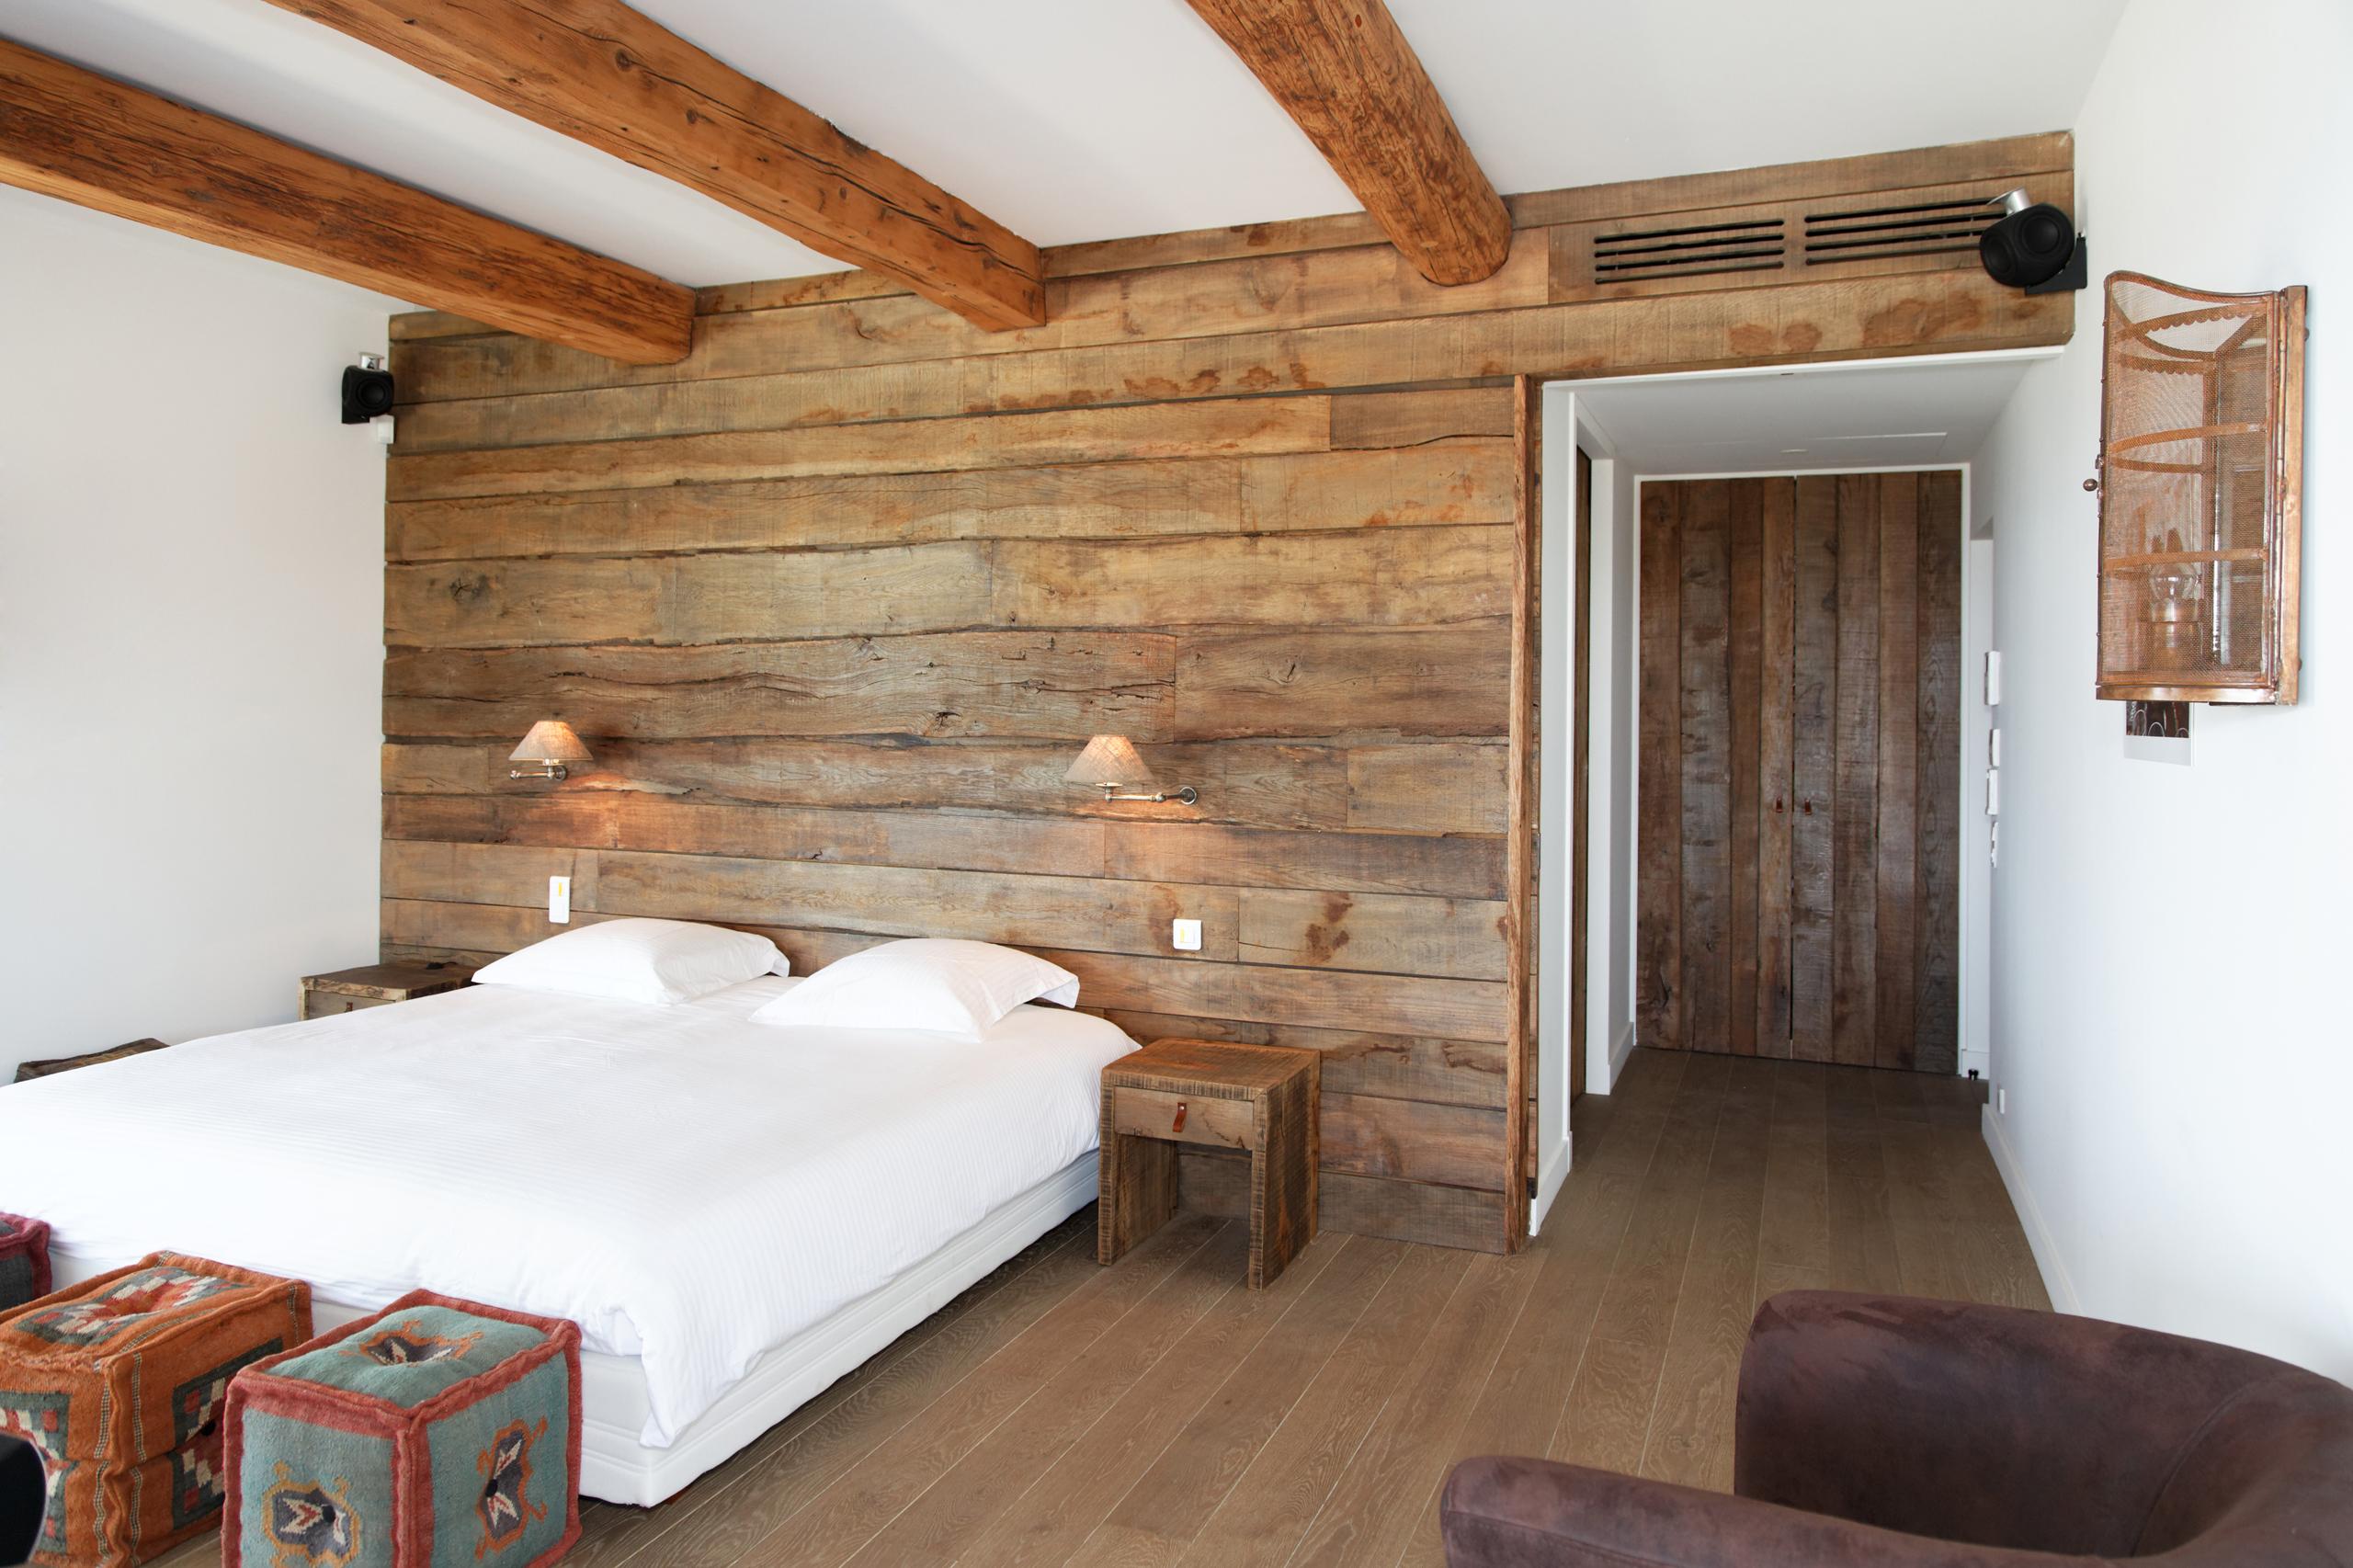 Chambre de villa grimaud bv menuiserie rafflin for Interieur en bois